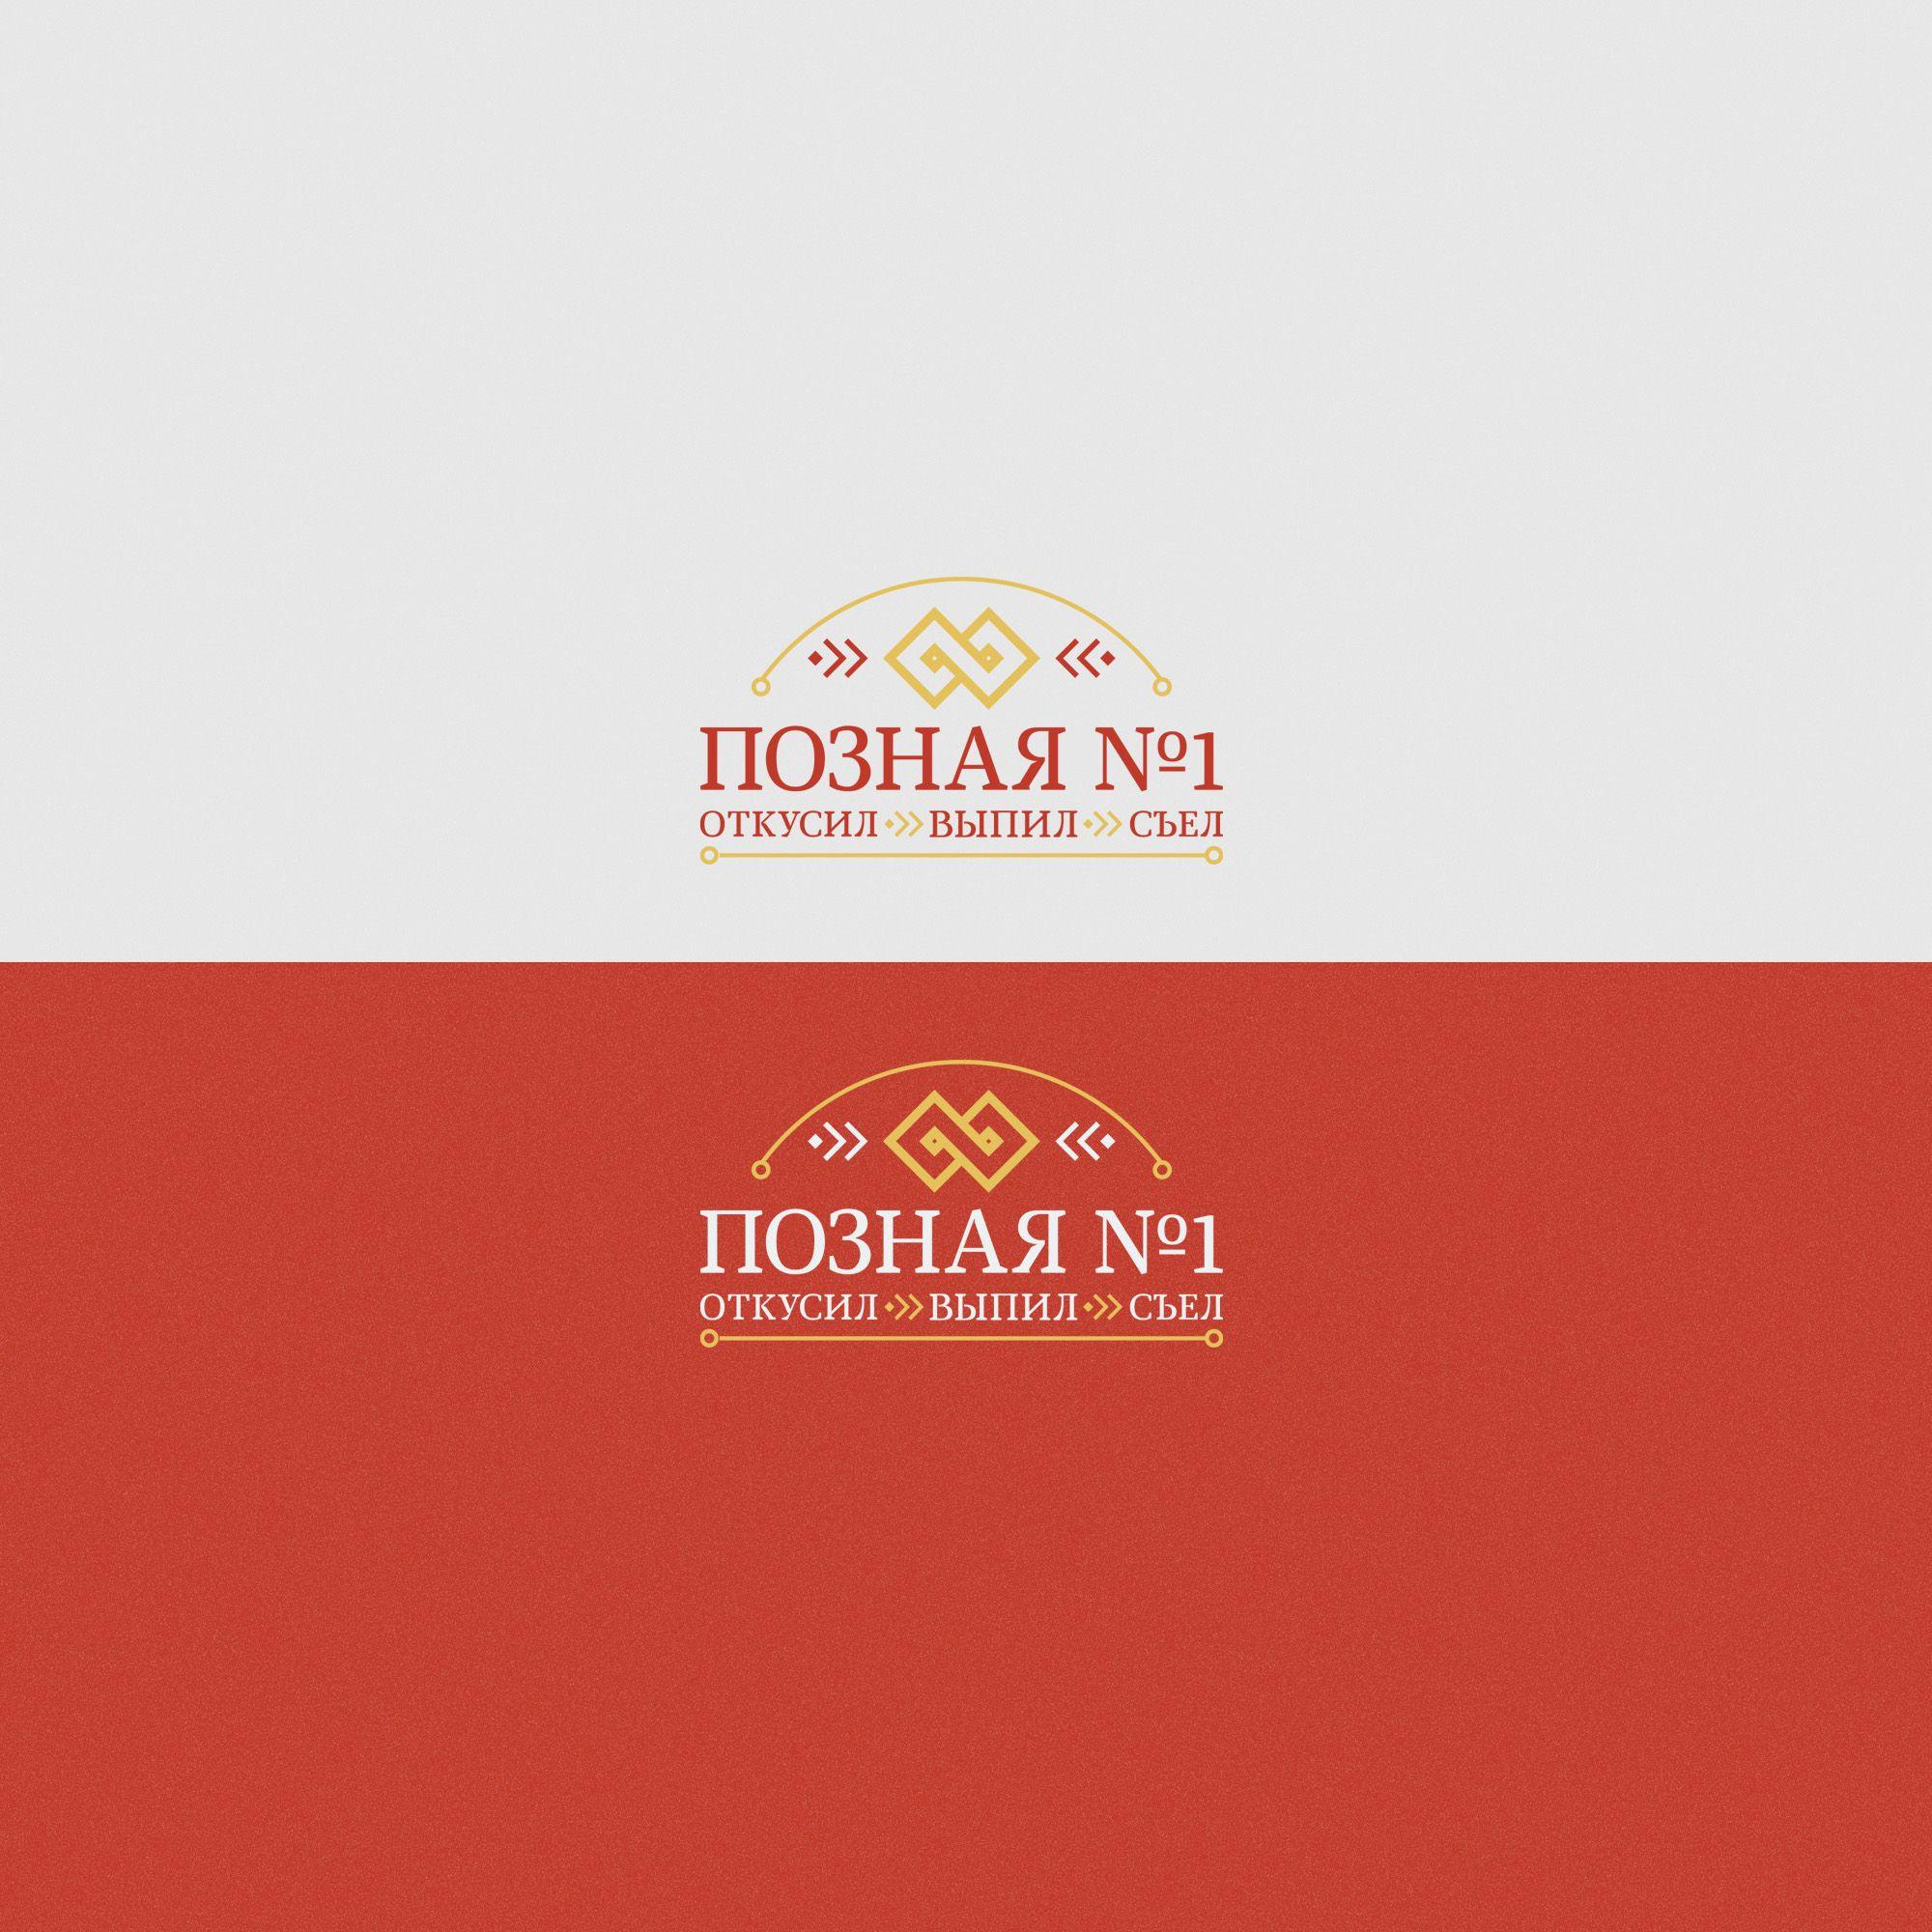 Логотип для кафе - дизайнер Gas-Min